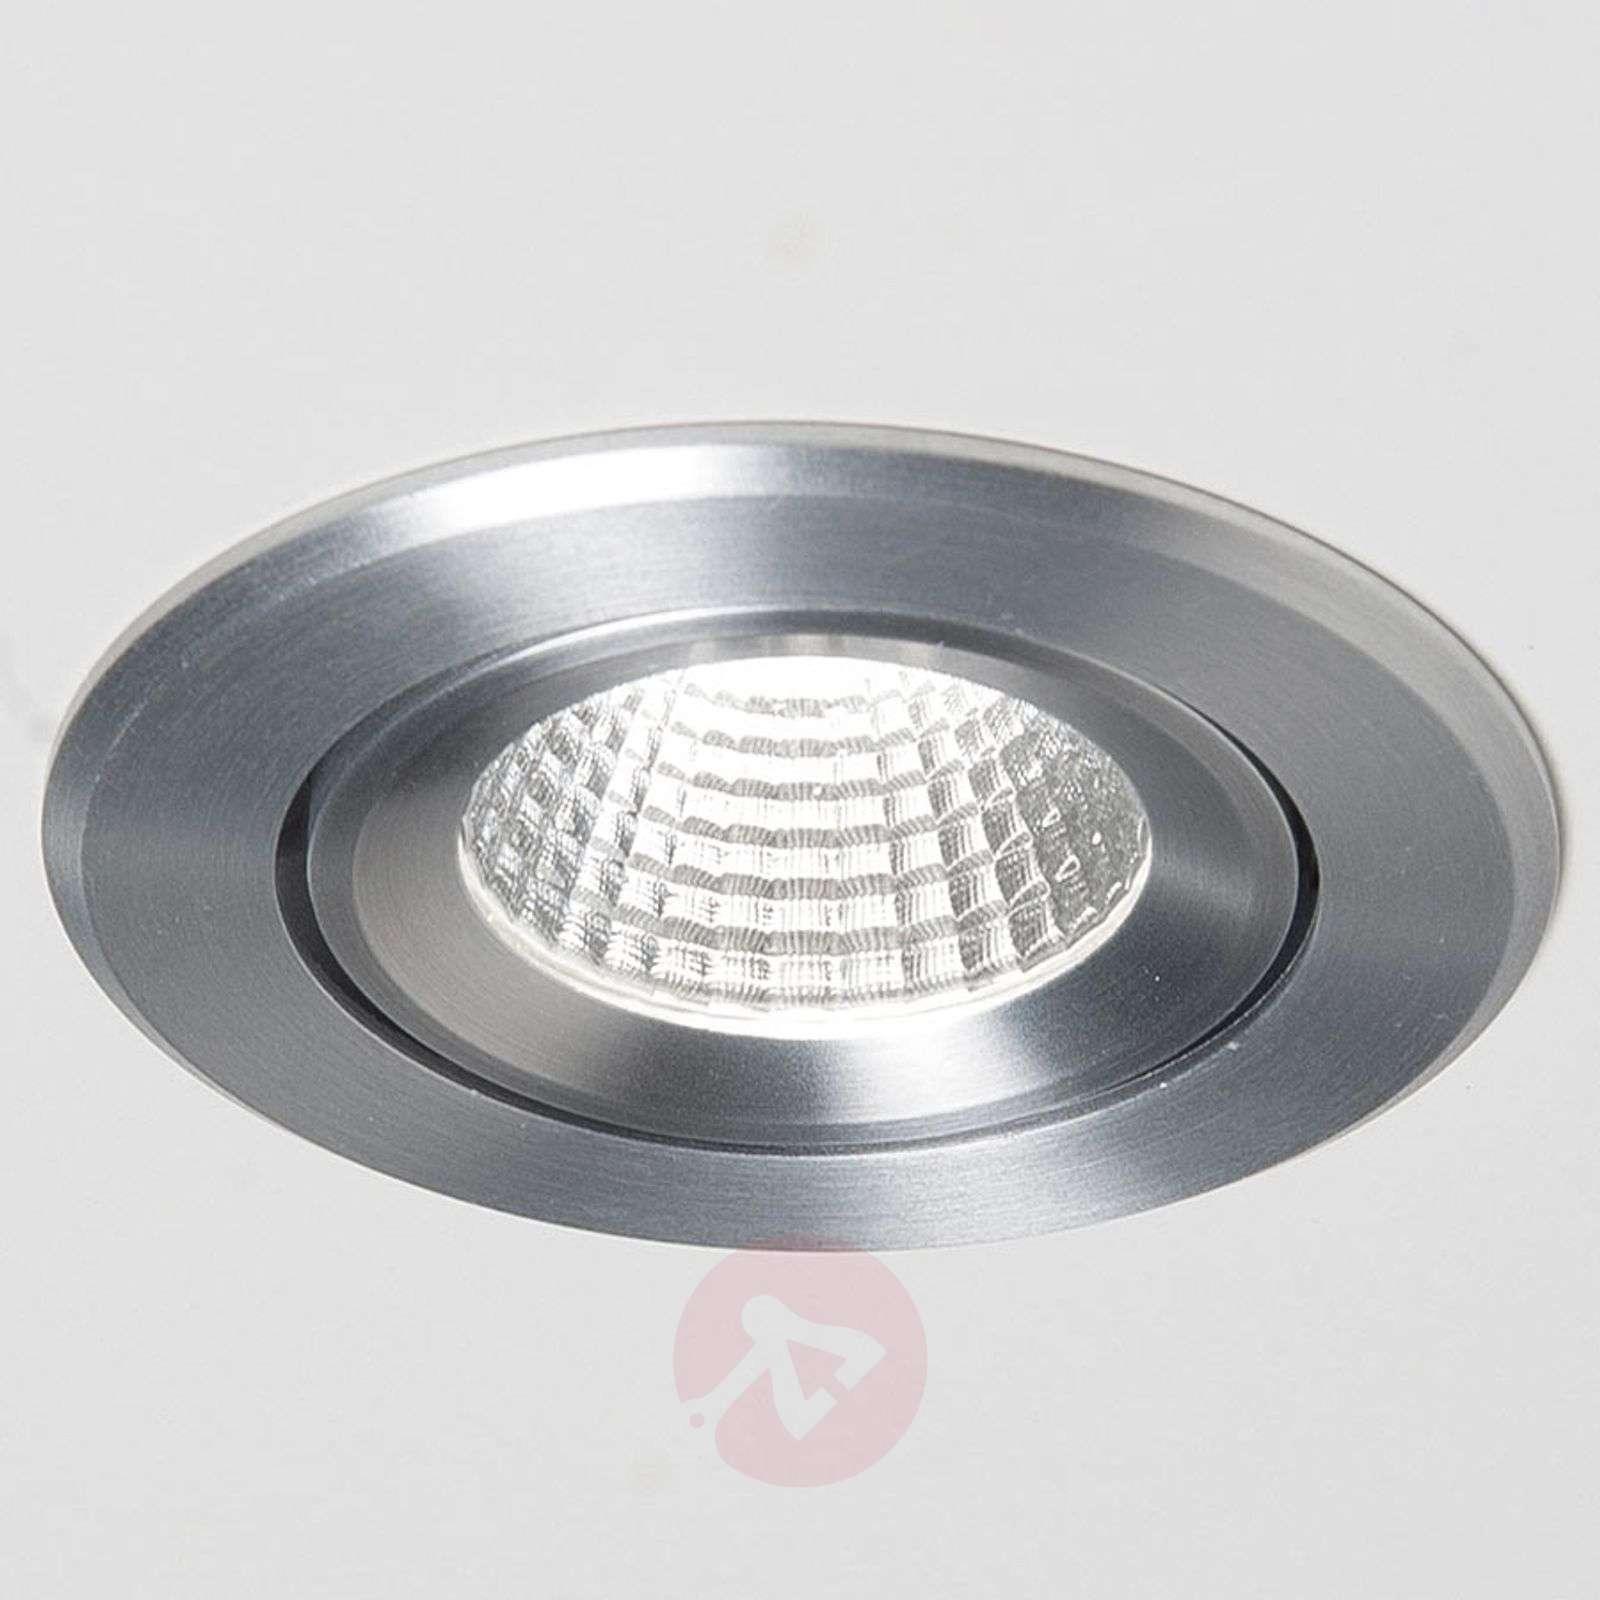 LED-uppospotti Agon Round 3000K, 40degree, alumiini-6523700-01